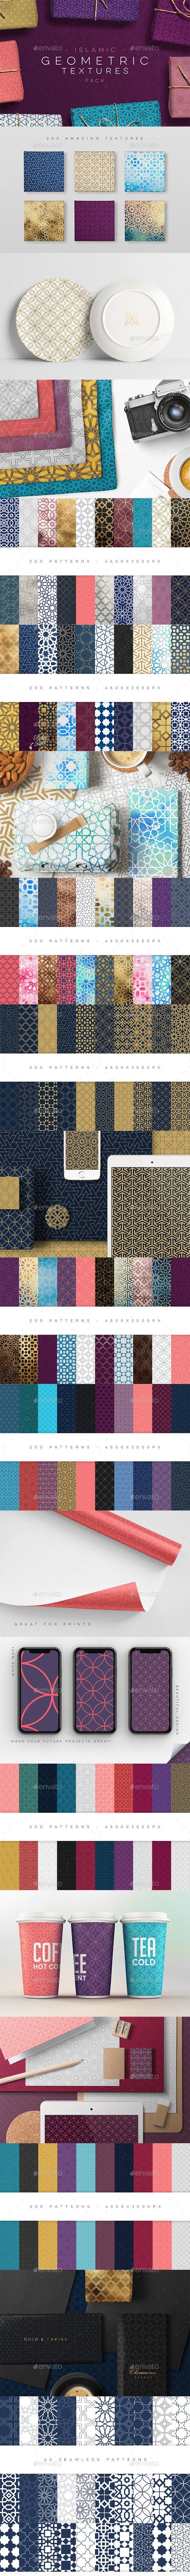 Geometric Patterns Islamic Ed. - Patterns Backgrounds